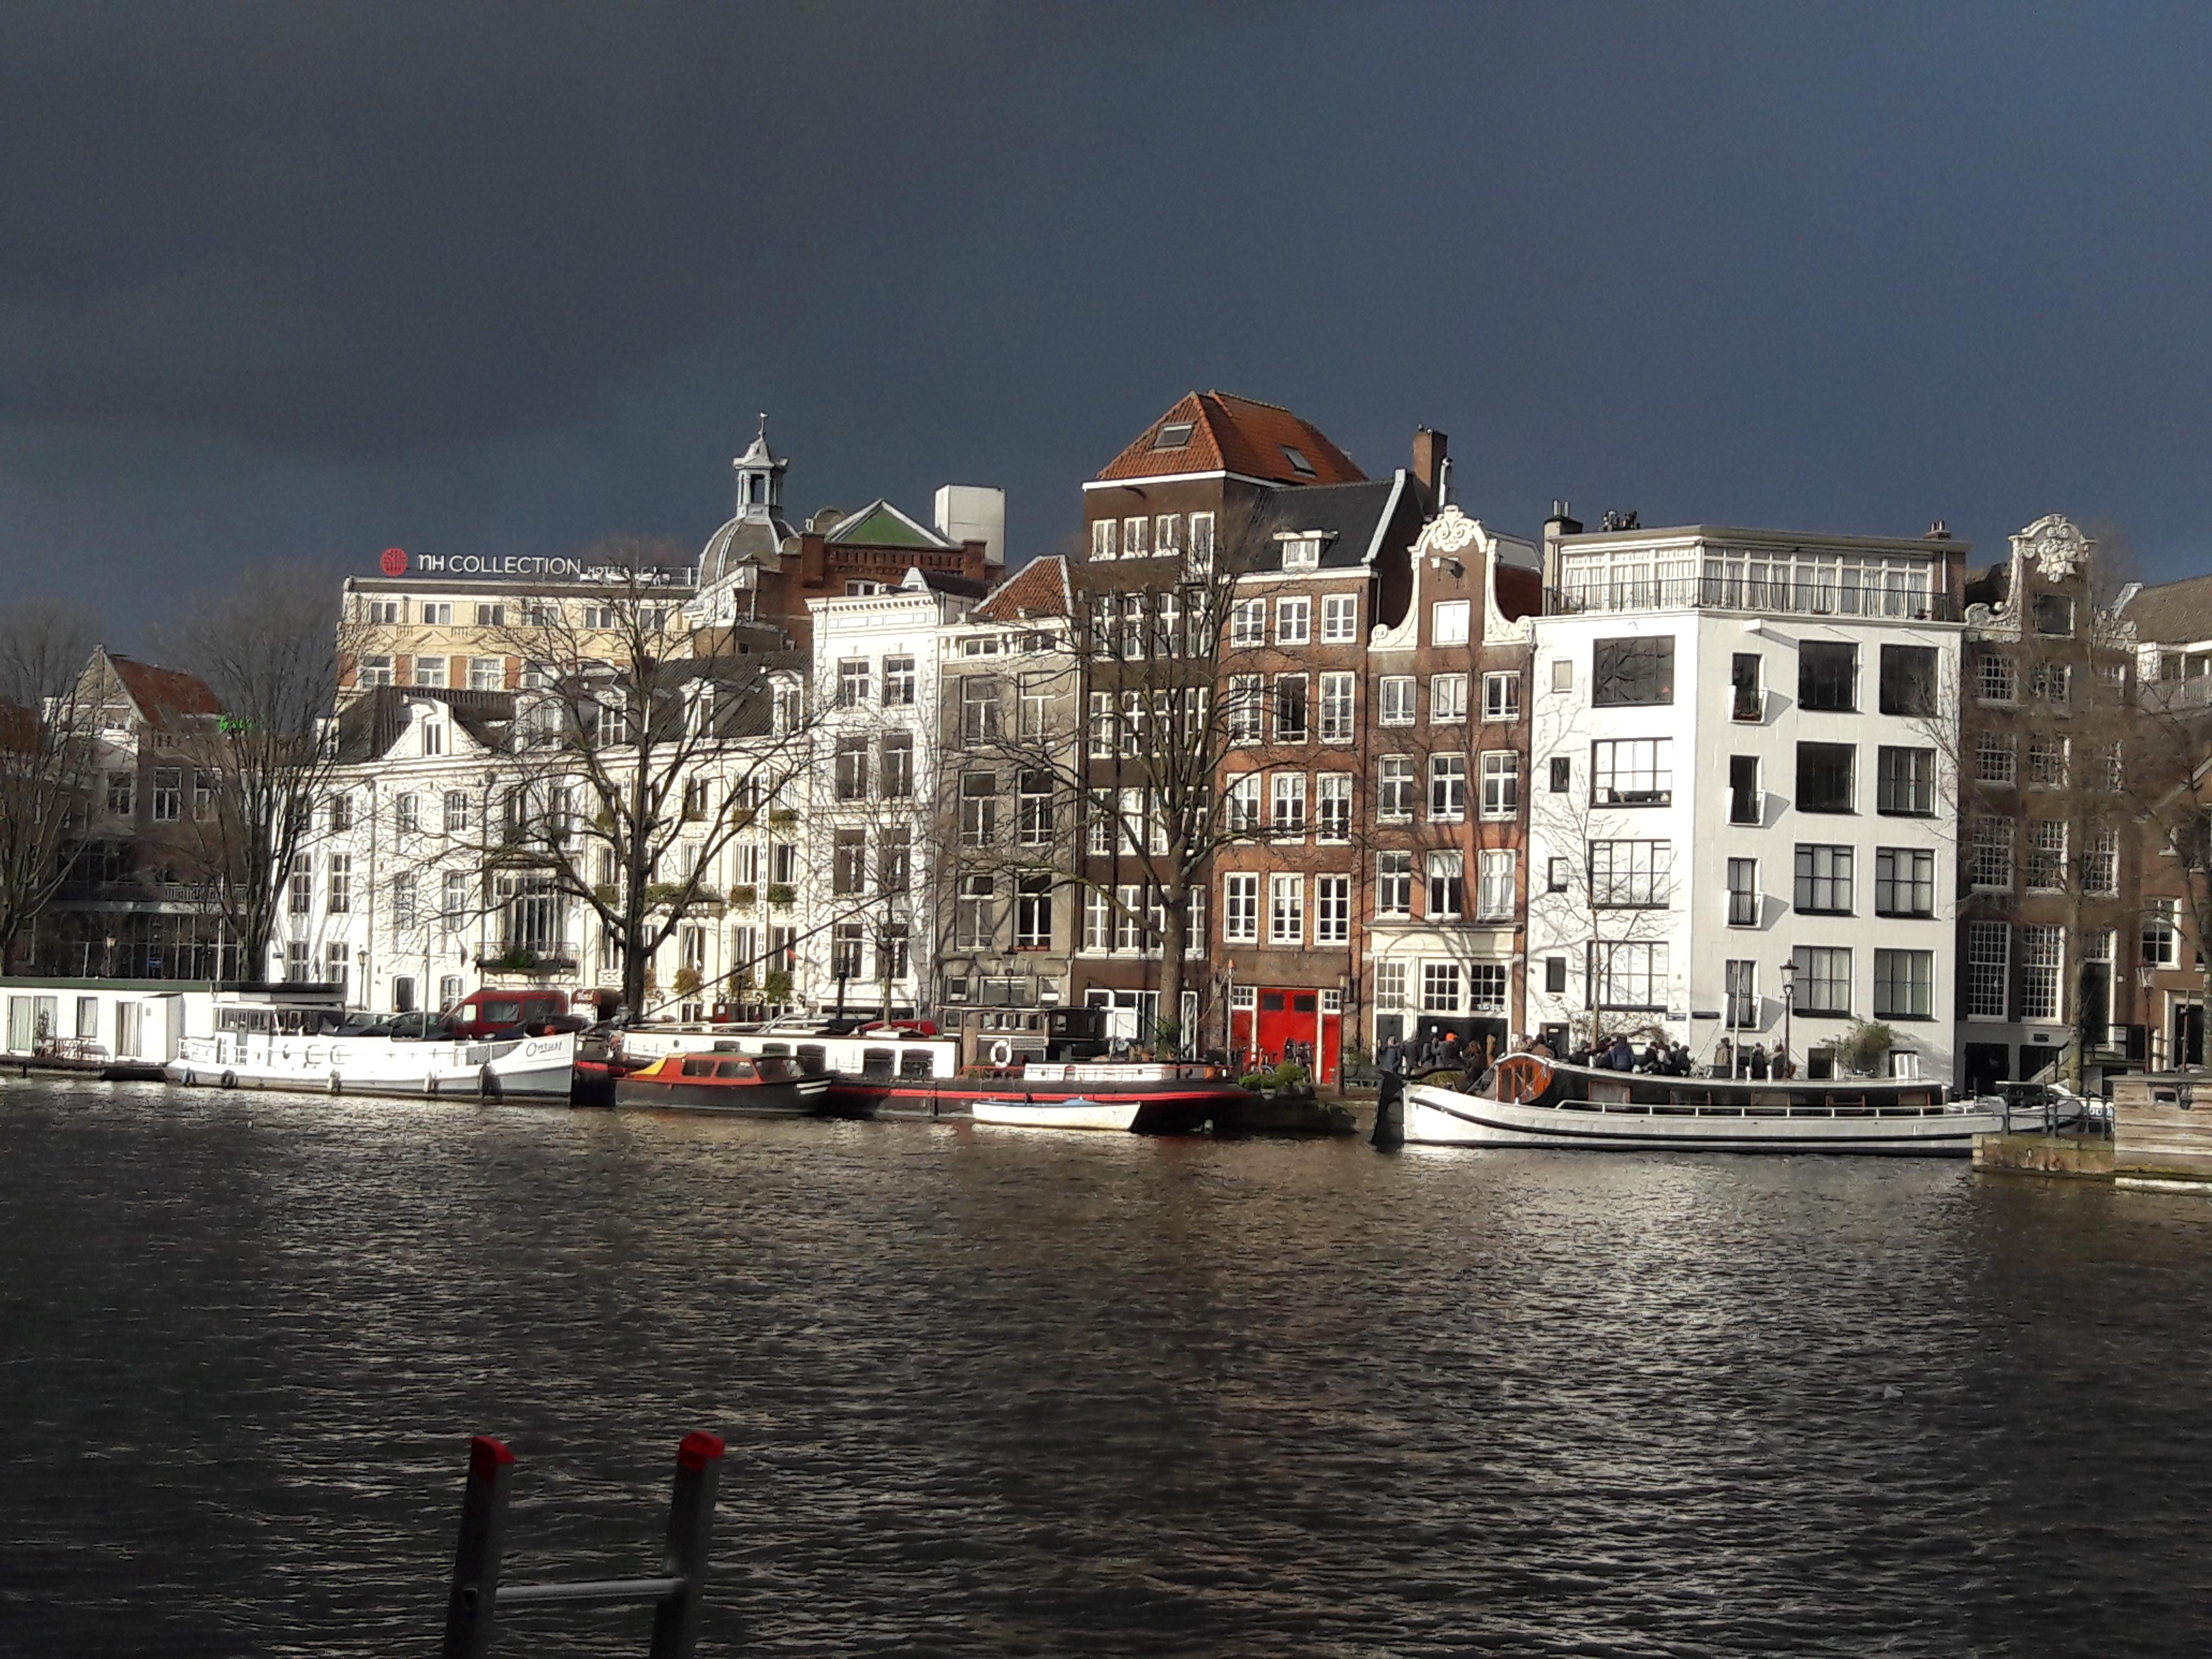 foto amsterdam speciaal licht 2